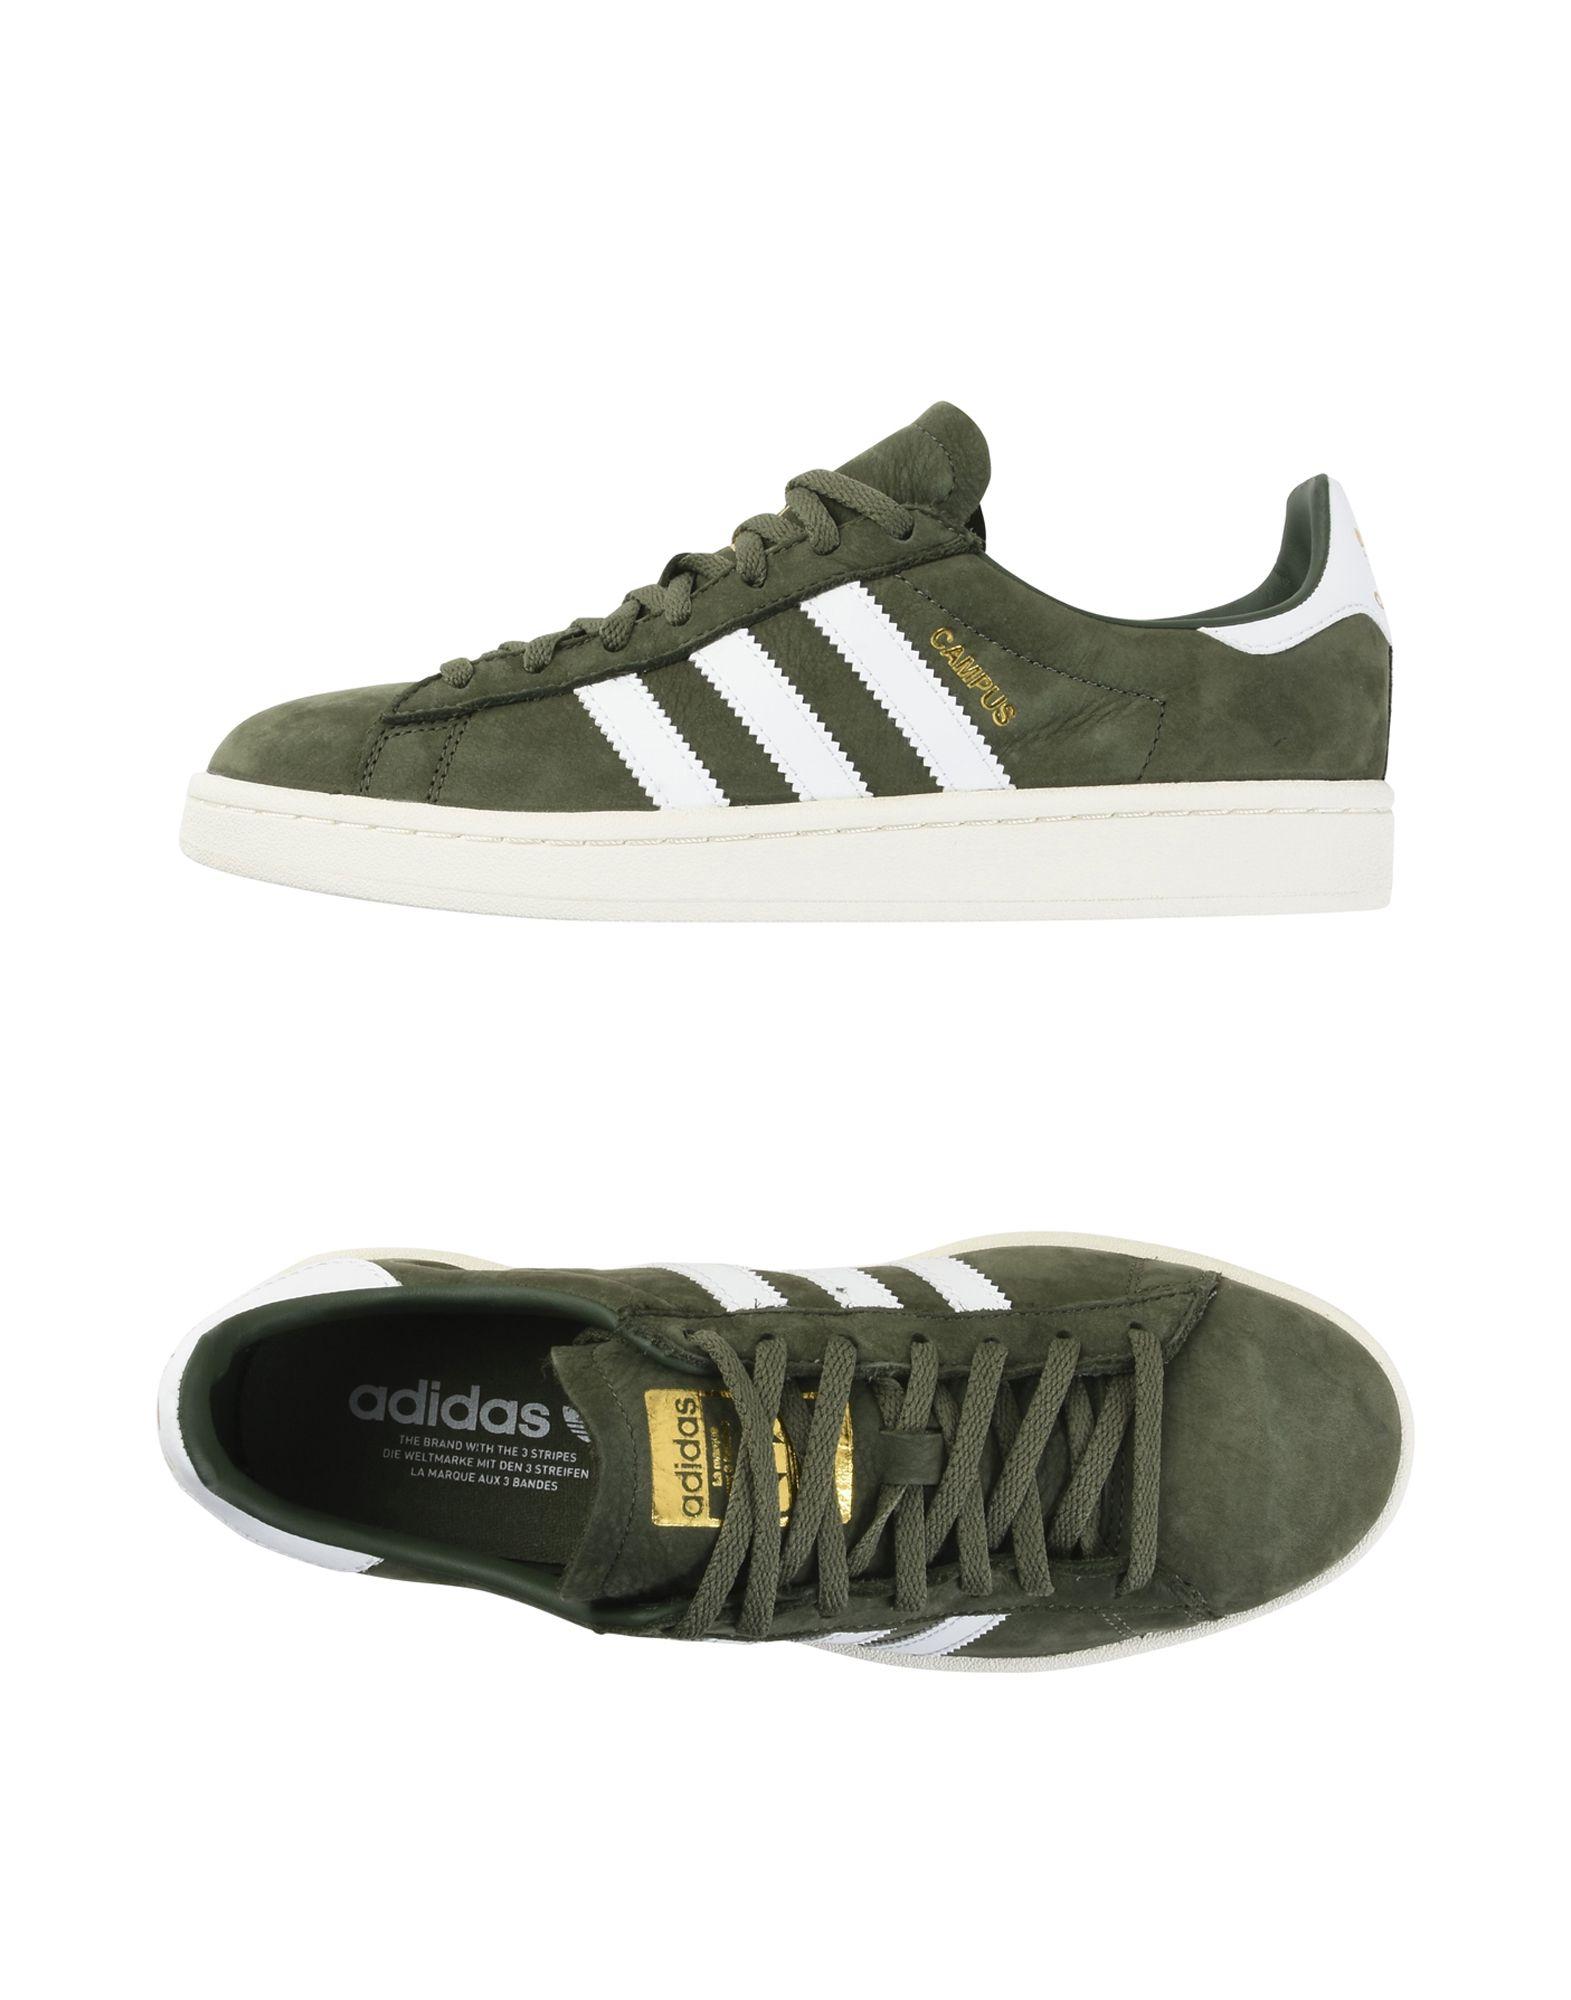 Adidas Originals Campus W - Sneakers - Women Adidas Originals Sneakers  online on YOOX Bulgaria - 11307911XL 9e74f8faff